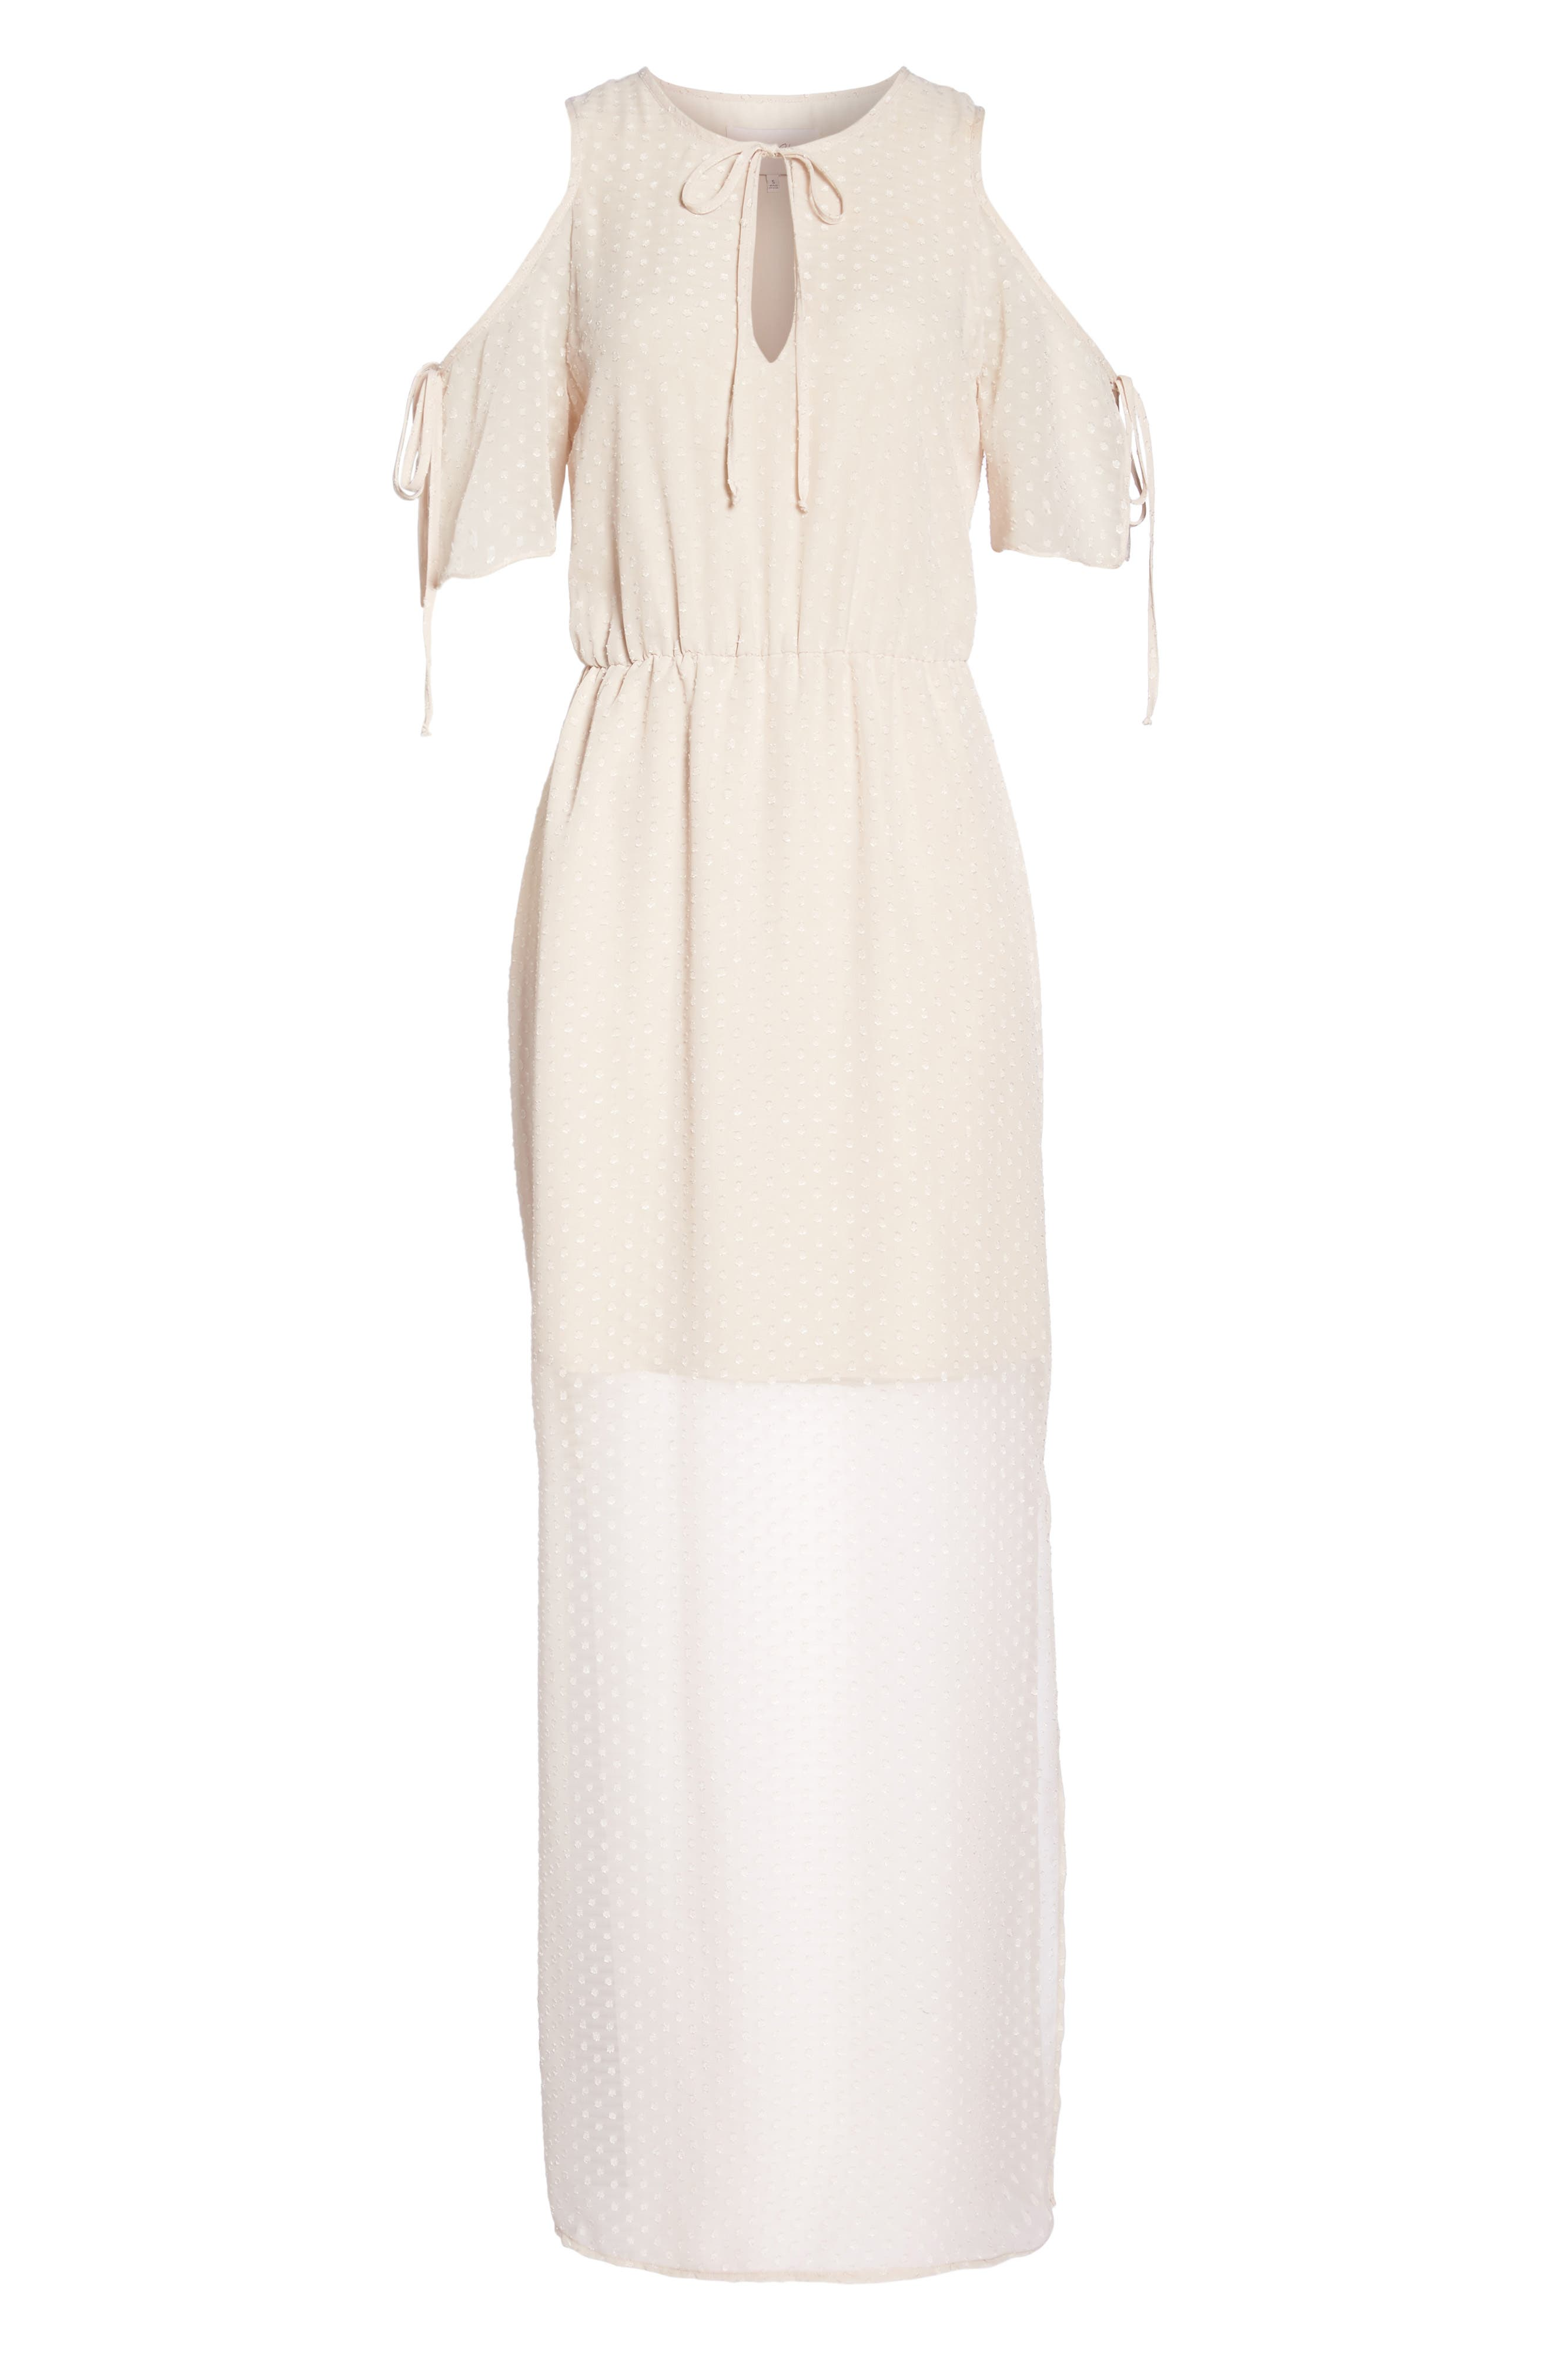 Tie Sleeve Cold Shoulder Maxi Dress,                             Alternate thumbnail 7, color,                             901